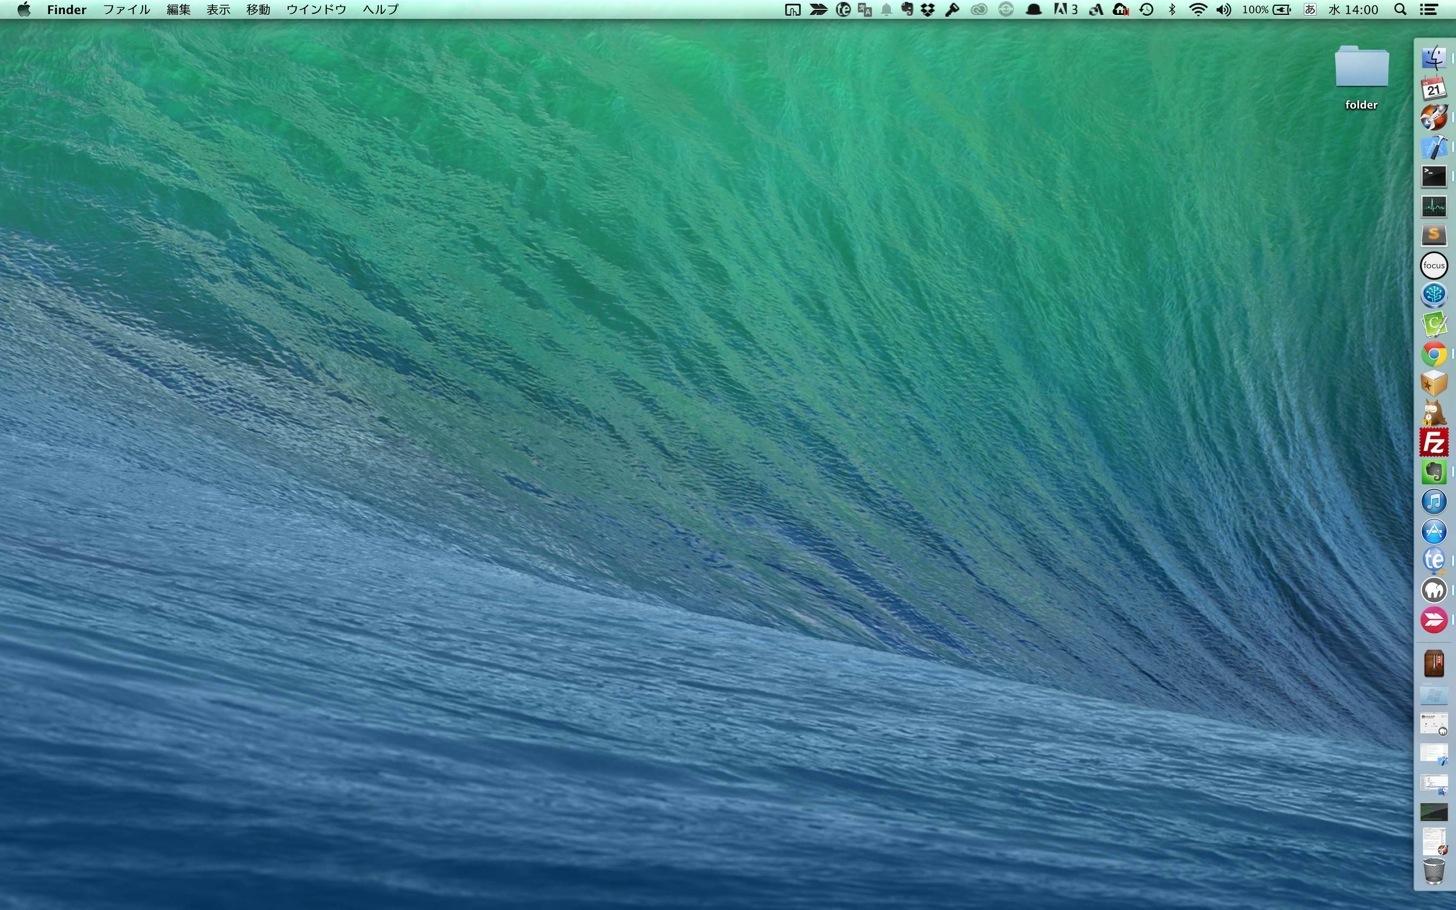 iPhone/iPadをMacに接続してもイメージキャプチャは起動しません。